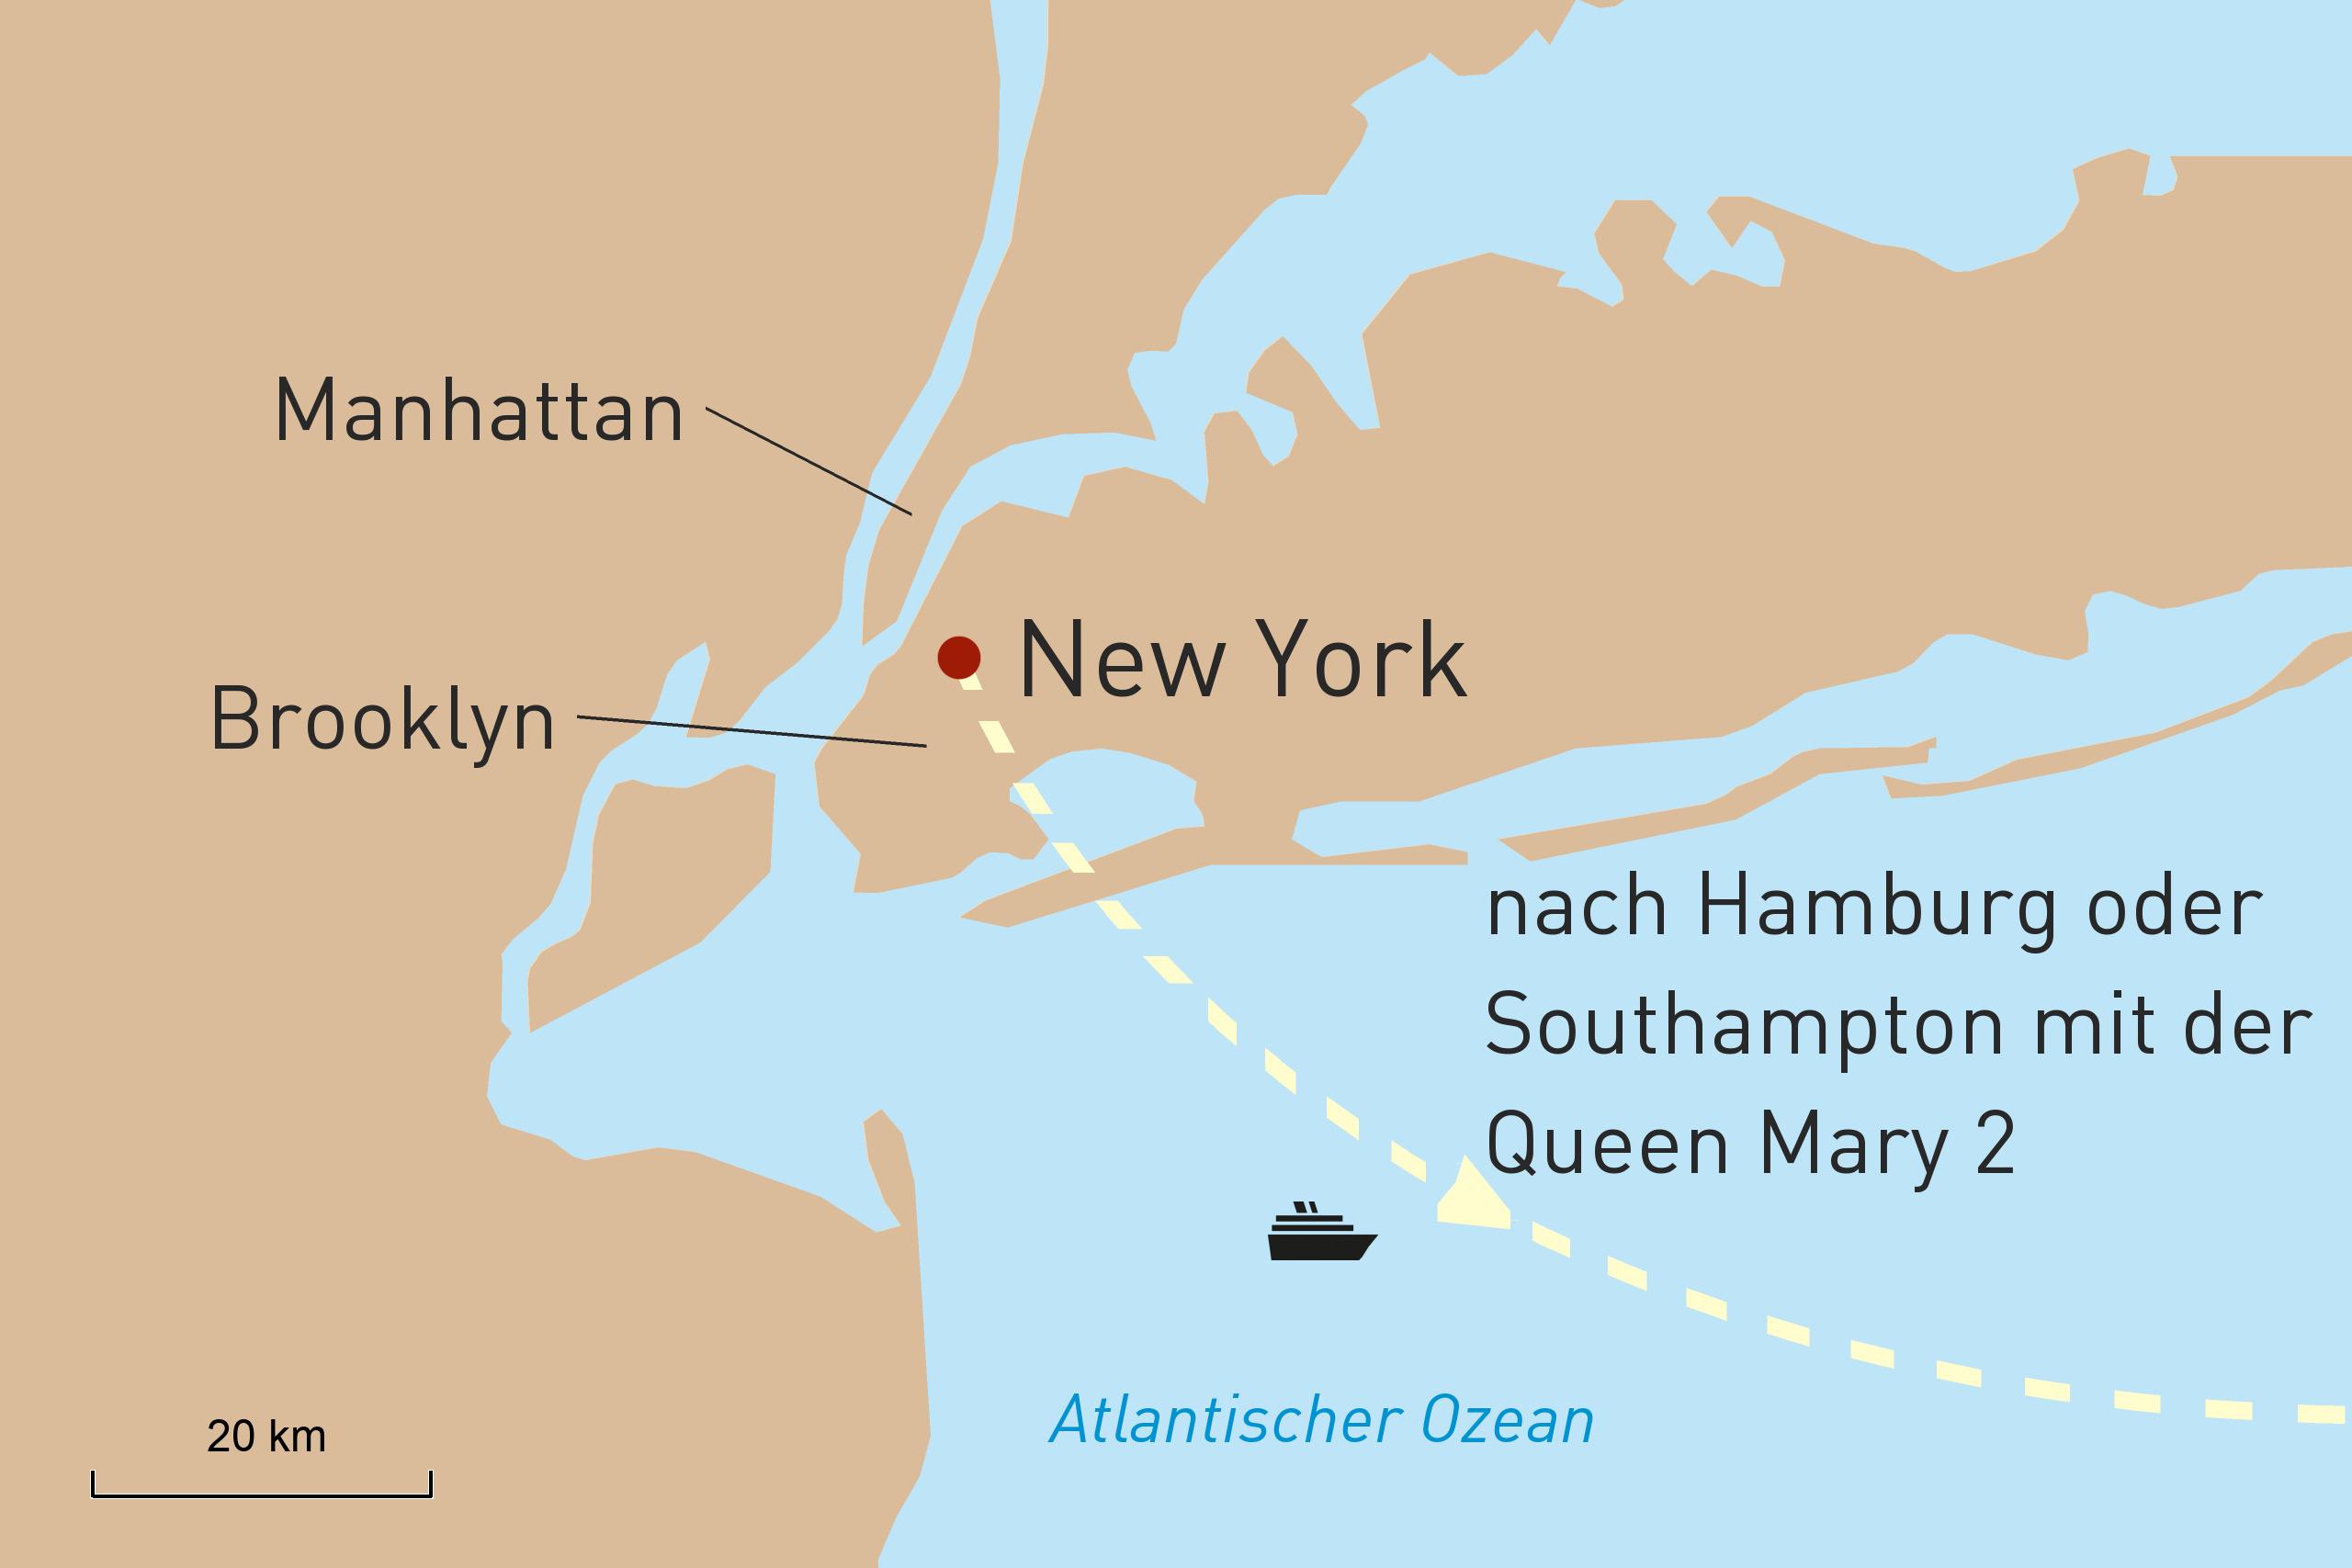 NYC-Atemberaubender Big Apple und Queen Mary 2